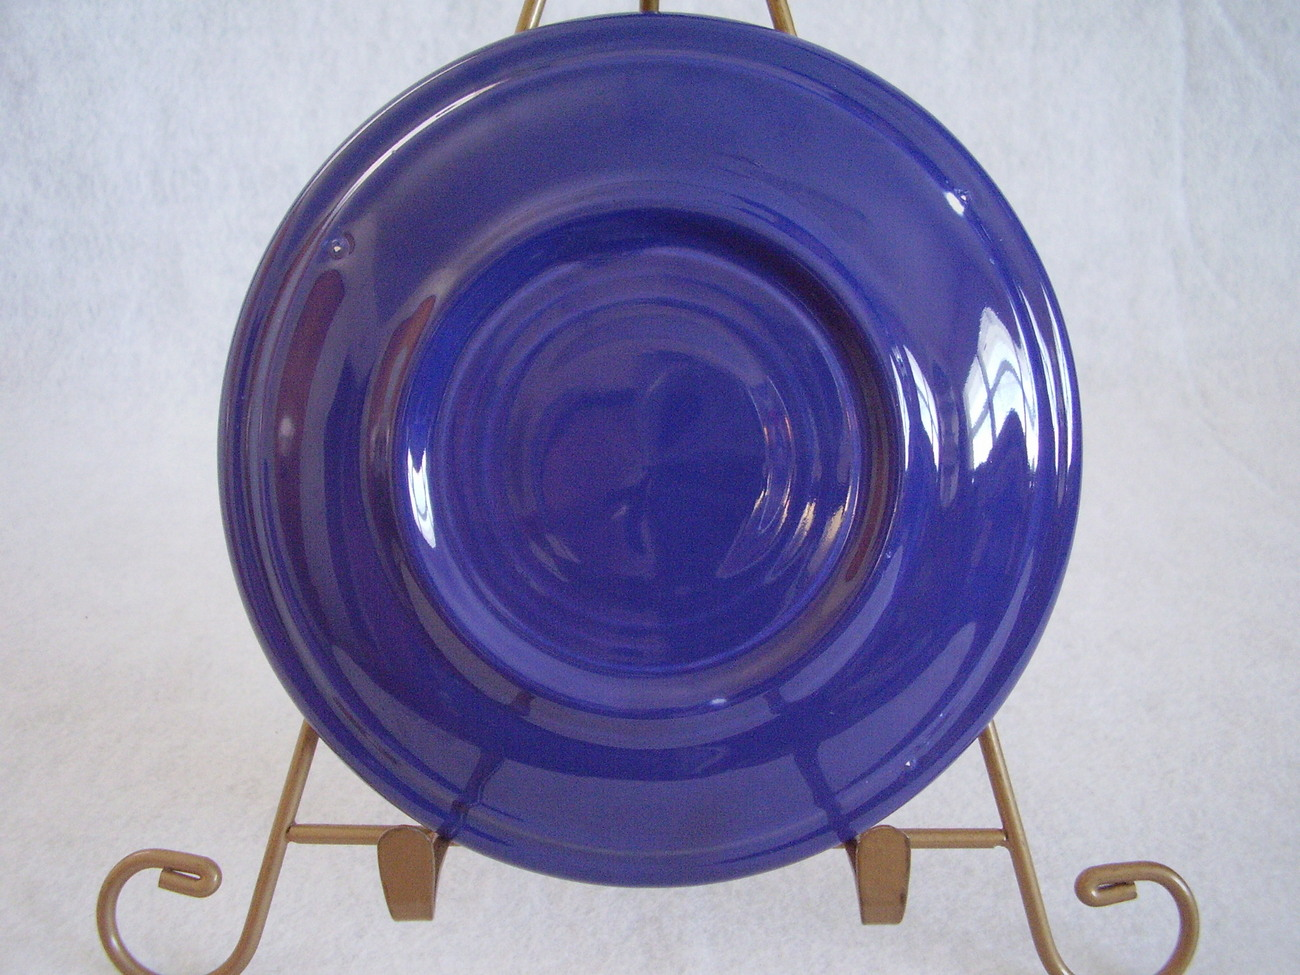 Vintage Fiestaware Cobalt Teacup Saucer Fiesta  G